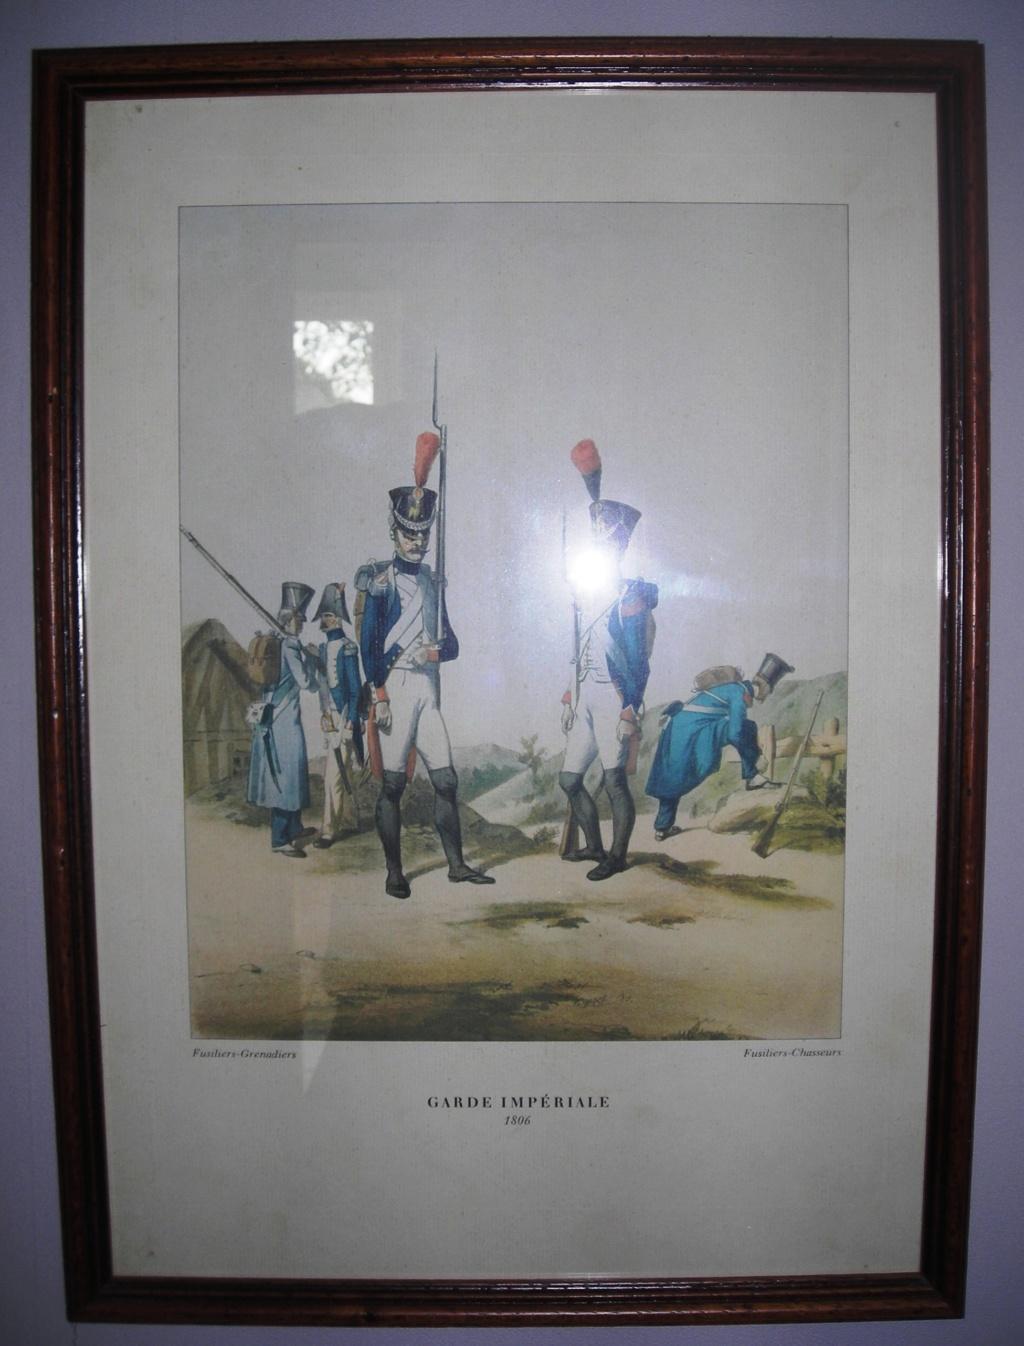 VENTE GRAVURES PREMIER EMPIRE, GARDE IMPERIALE. 180610